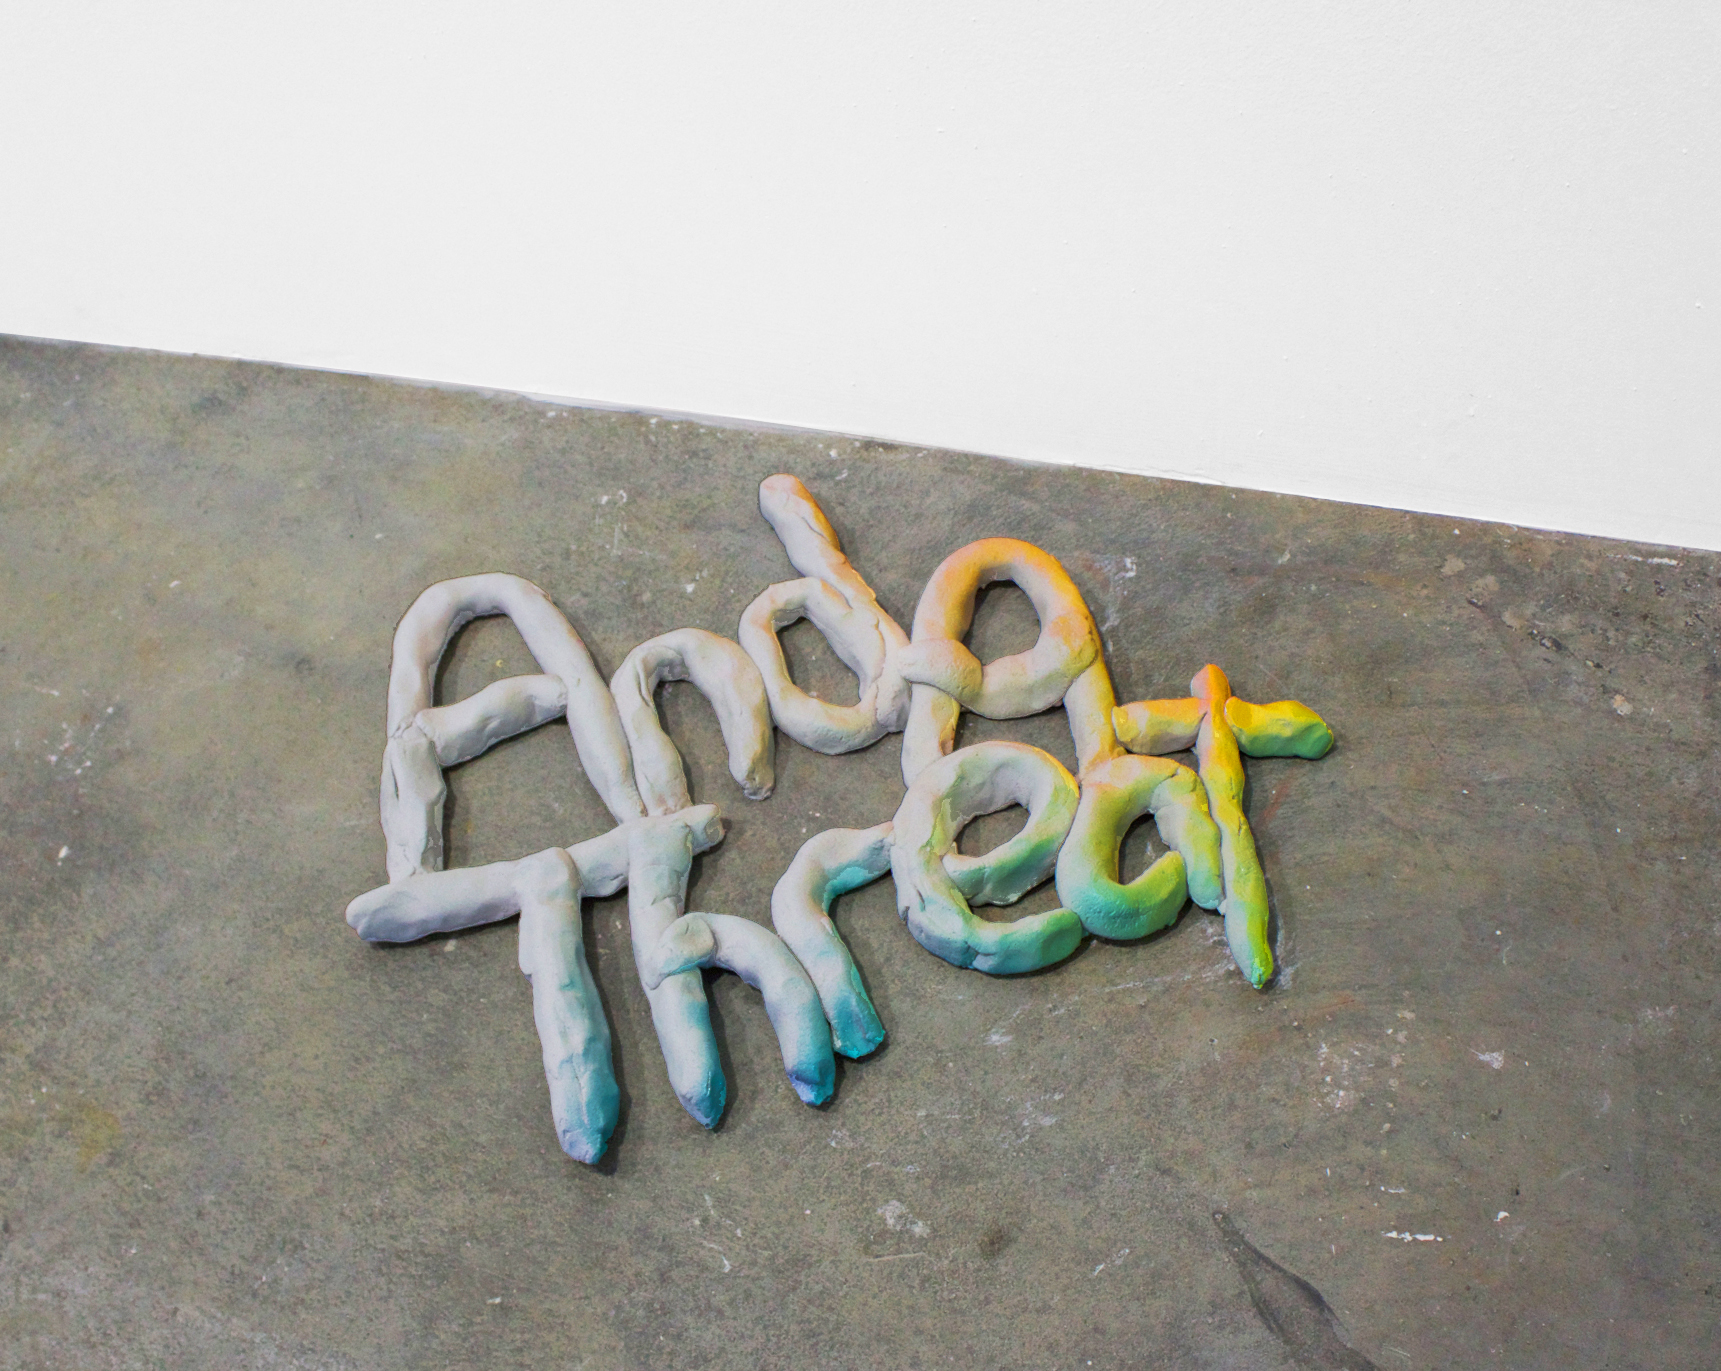 AndAThreat, 2017